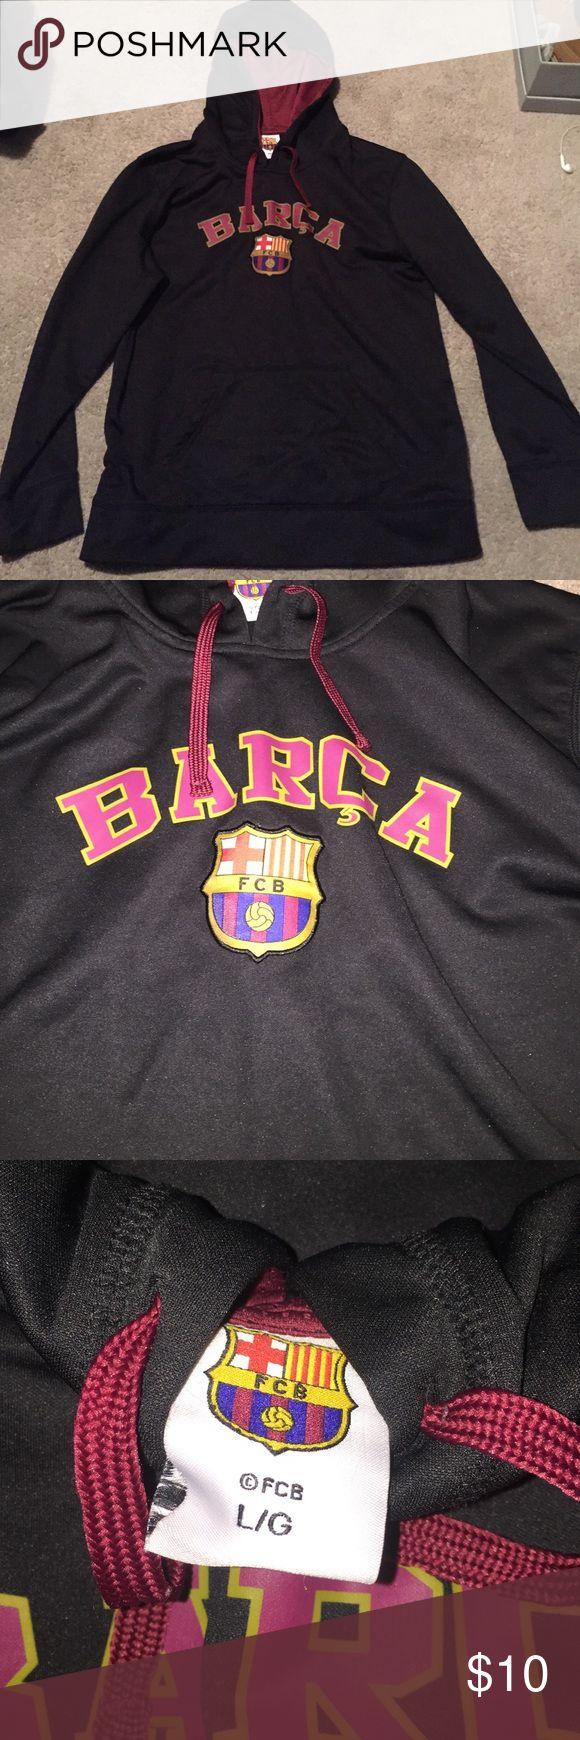 Men's FC Barcelona sweatshirt Men's black size large Fc Barcelona soccer sweatshirt. Great for soccer fans Shirts Sweatshirts & Hoodies